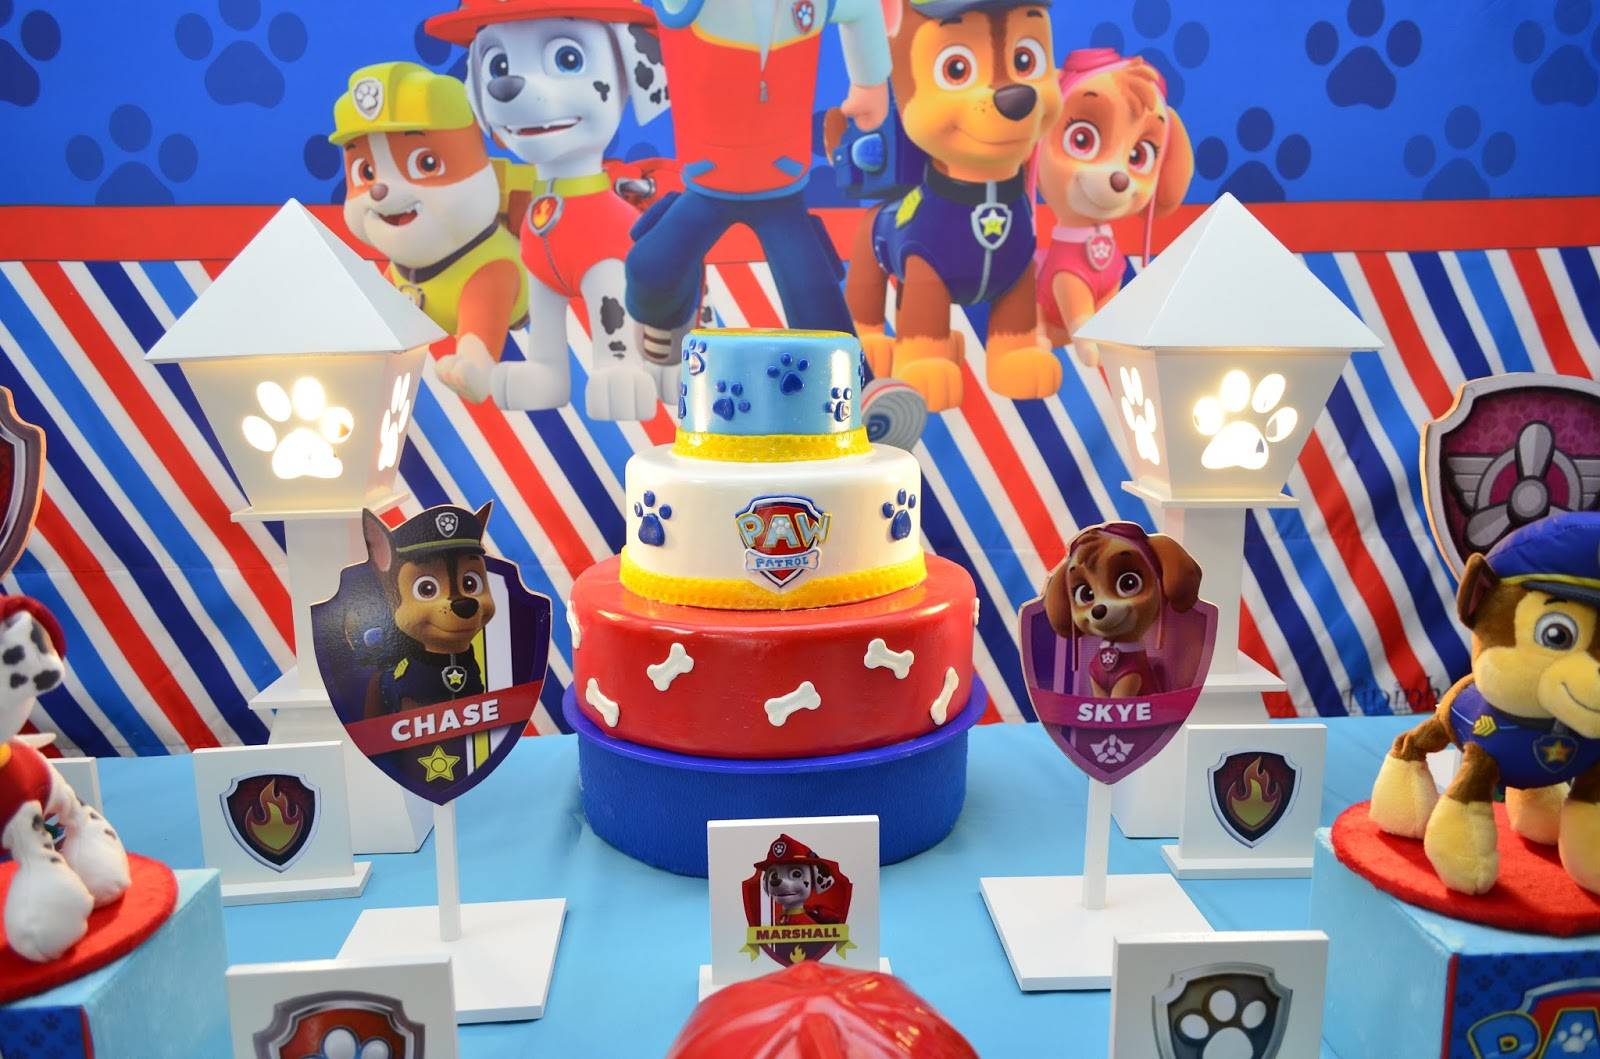 decoracao festa infantil patrulha canina : decoracao festa infantil patrulha canina:Patrulha Canina